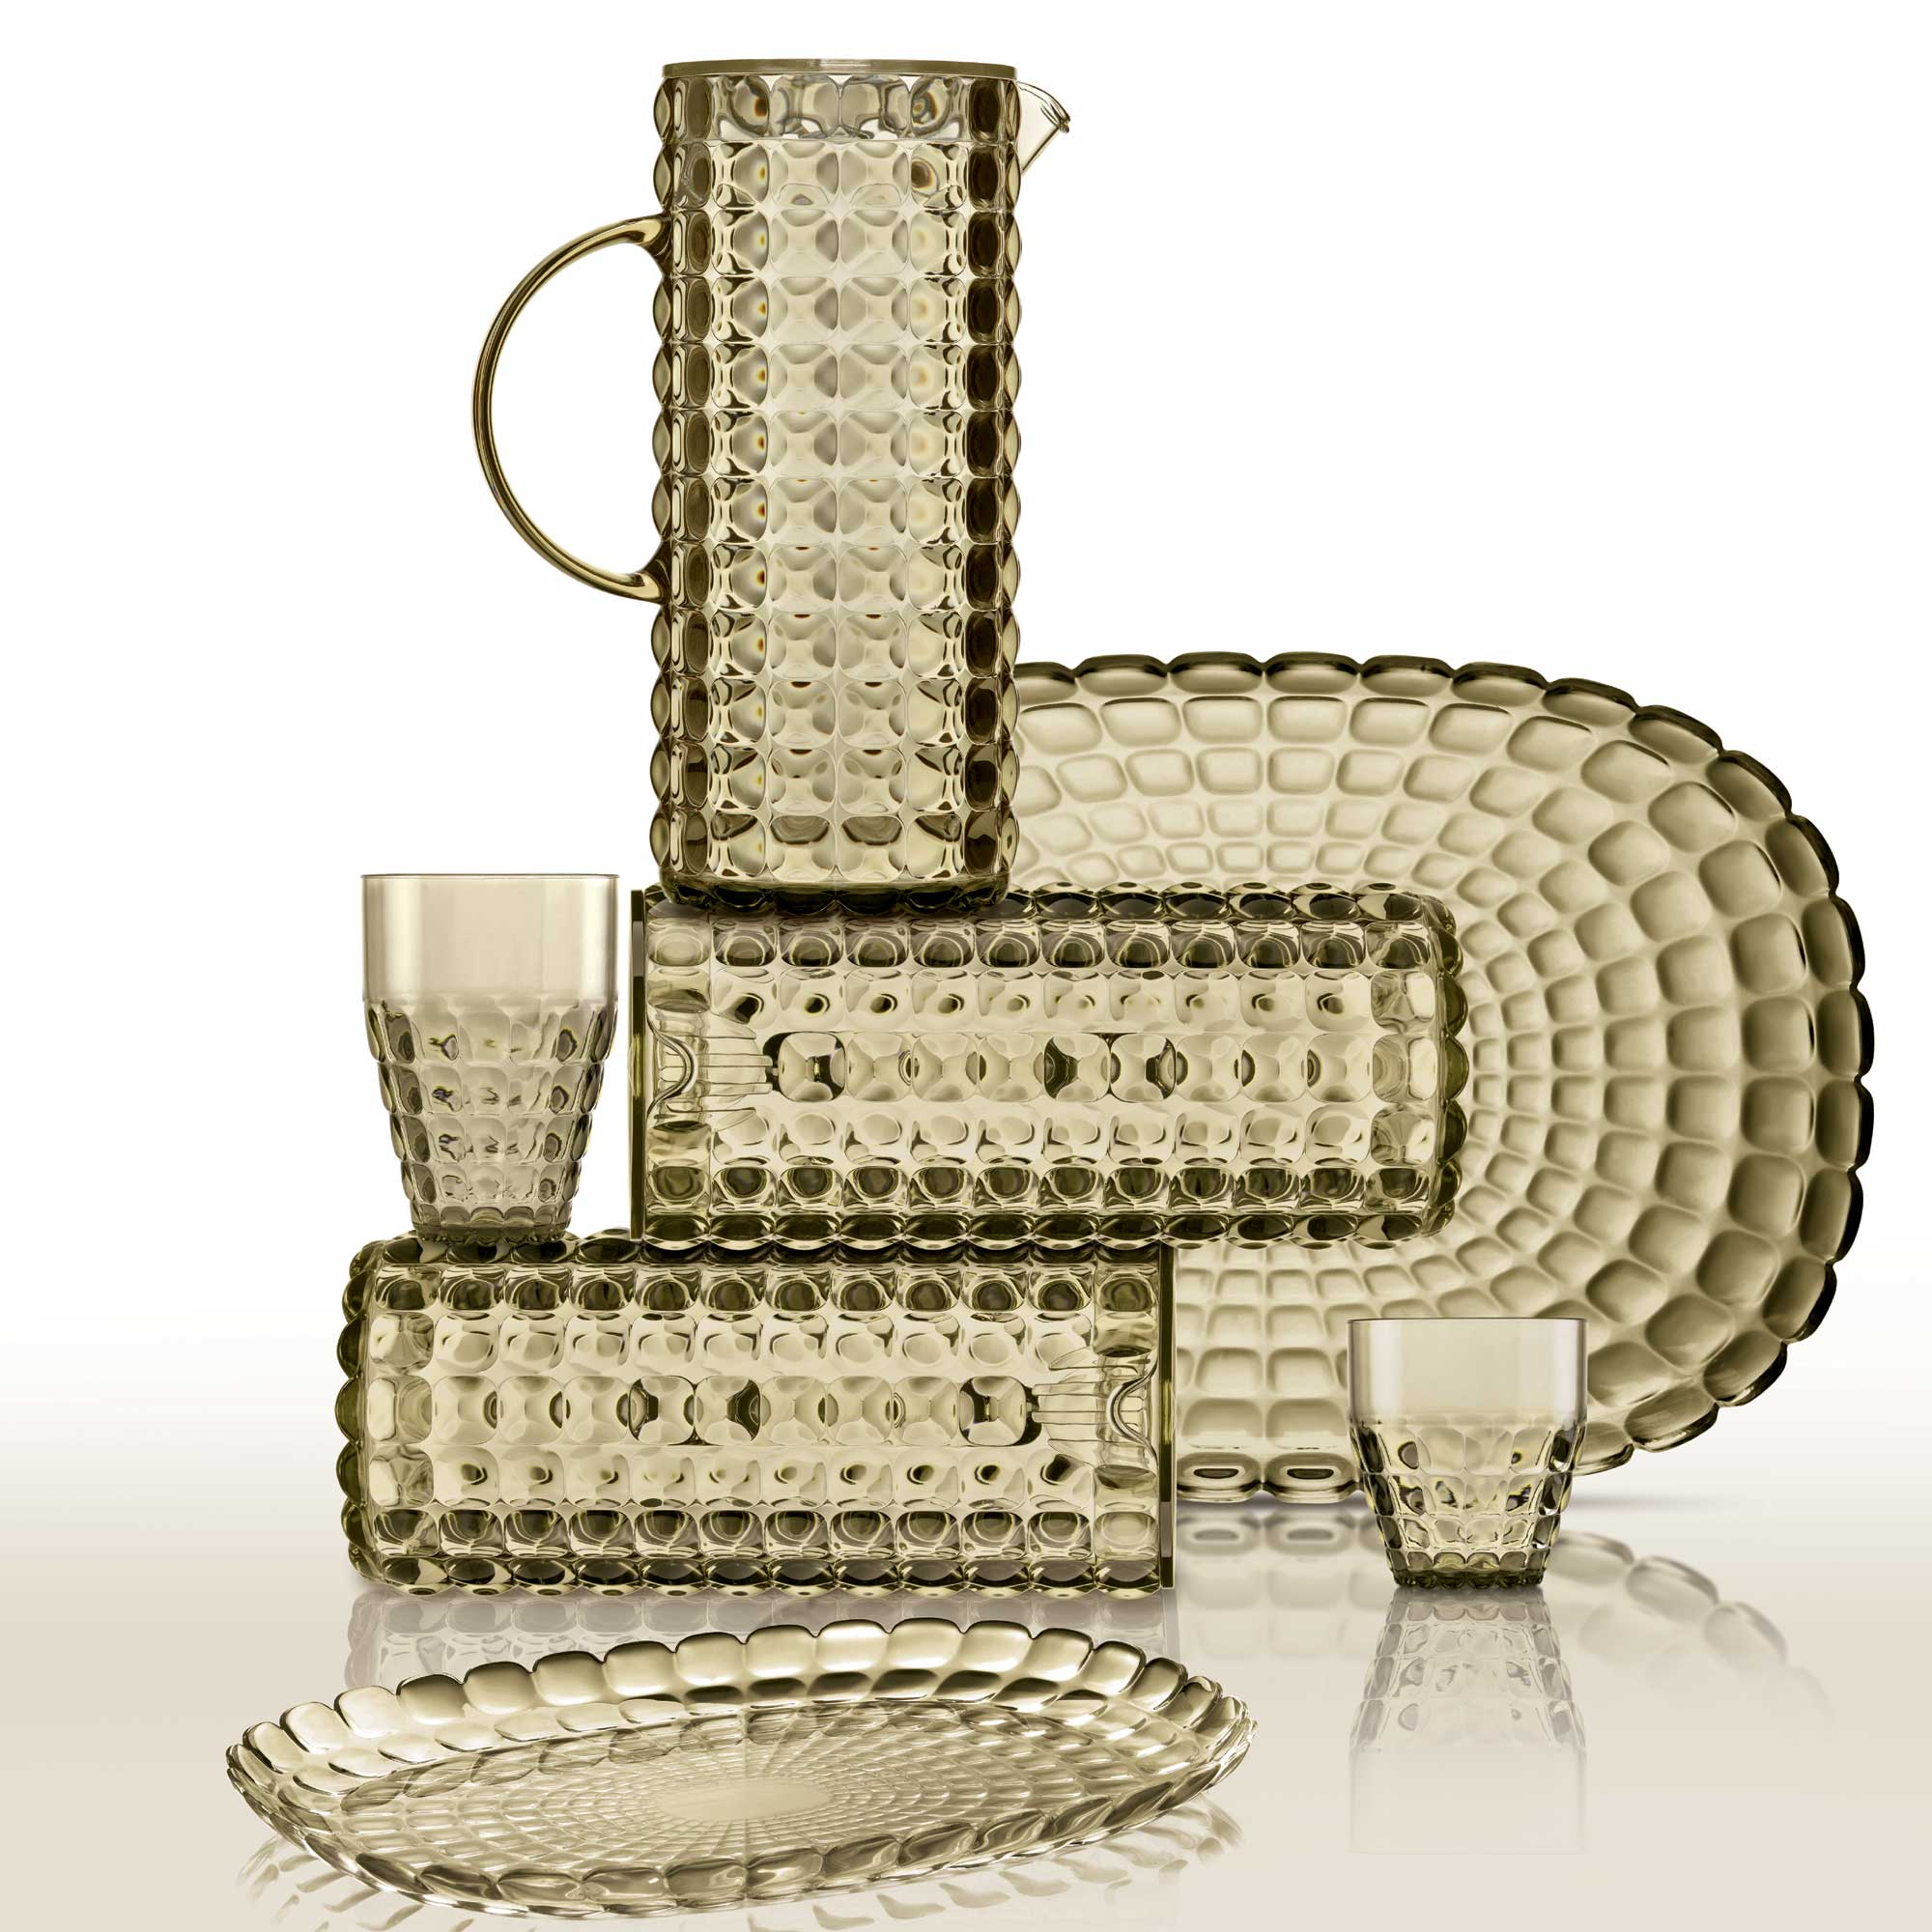 guzzini tiffany  Guzzini Tiffany Pitcher - Transparent Plastic w/ Sparkling Color Effects